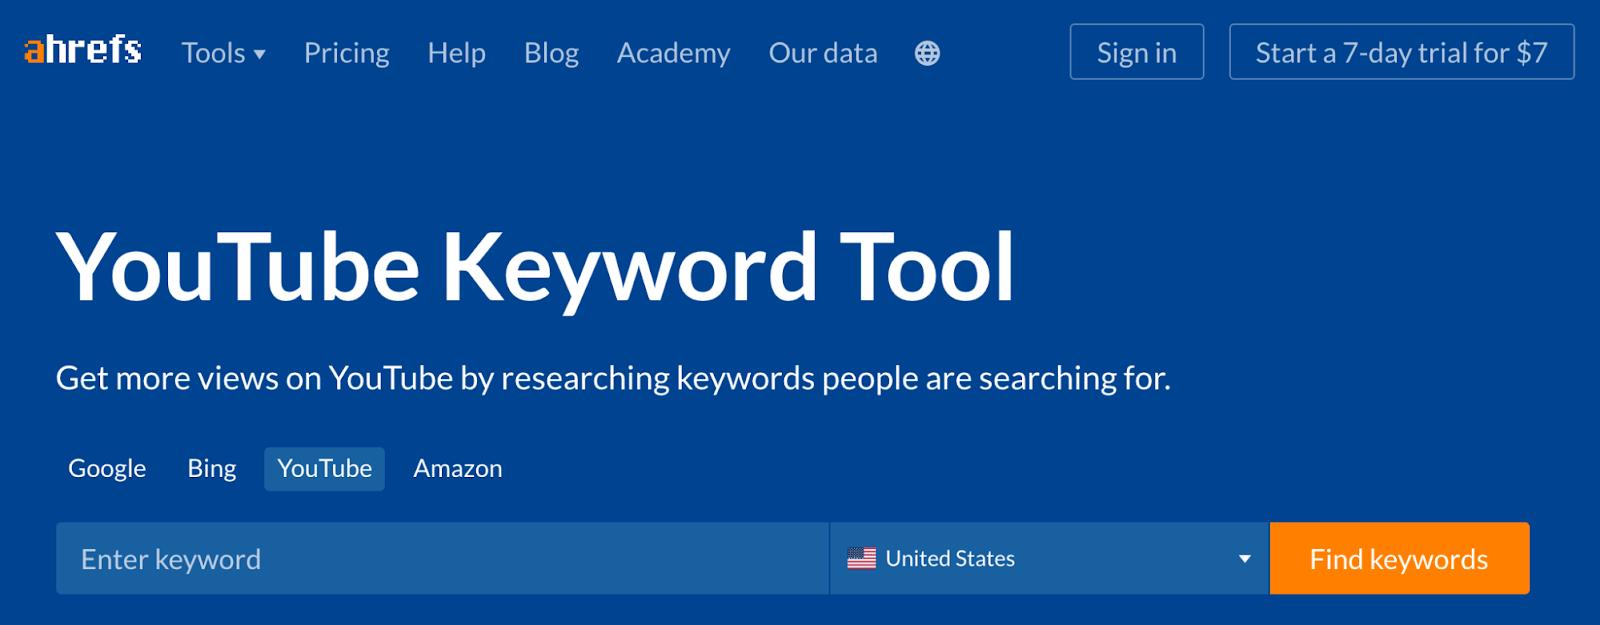 9 youtube keyword tool